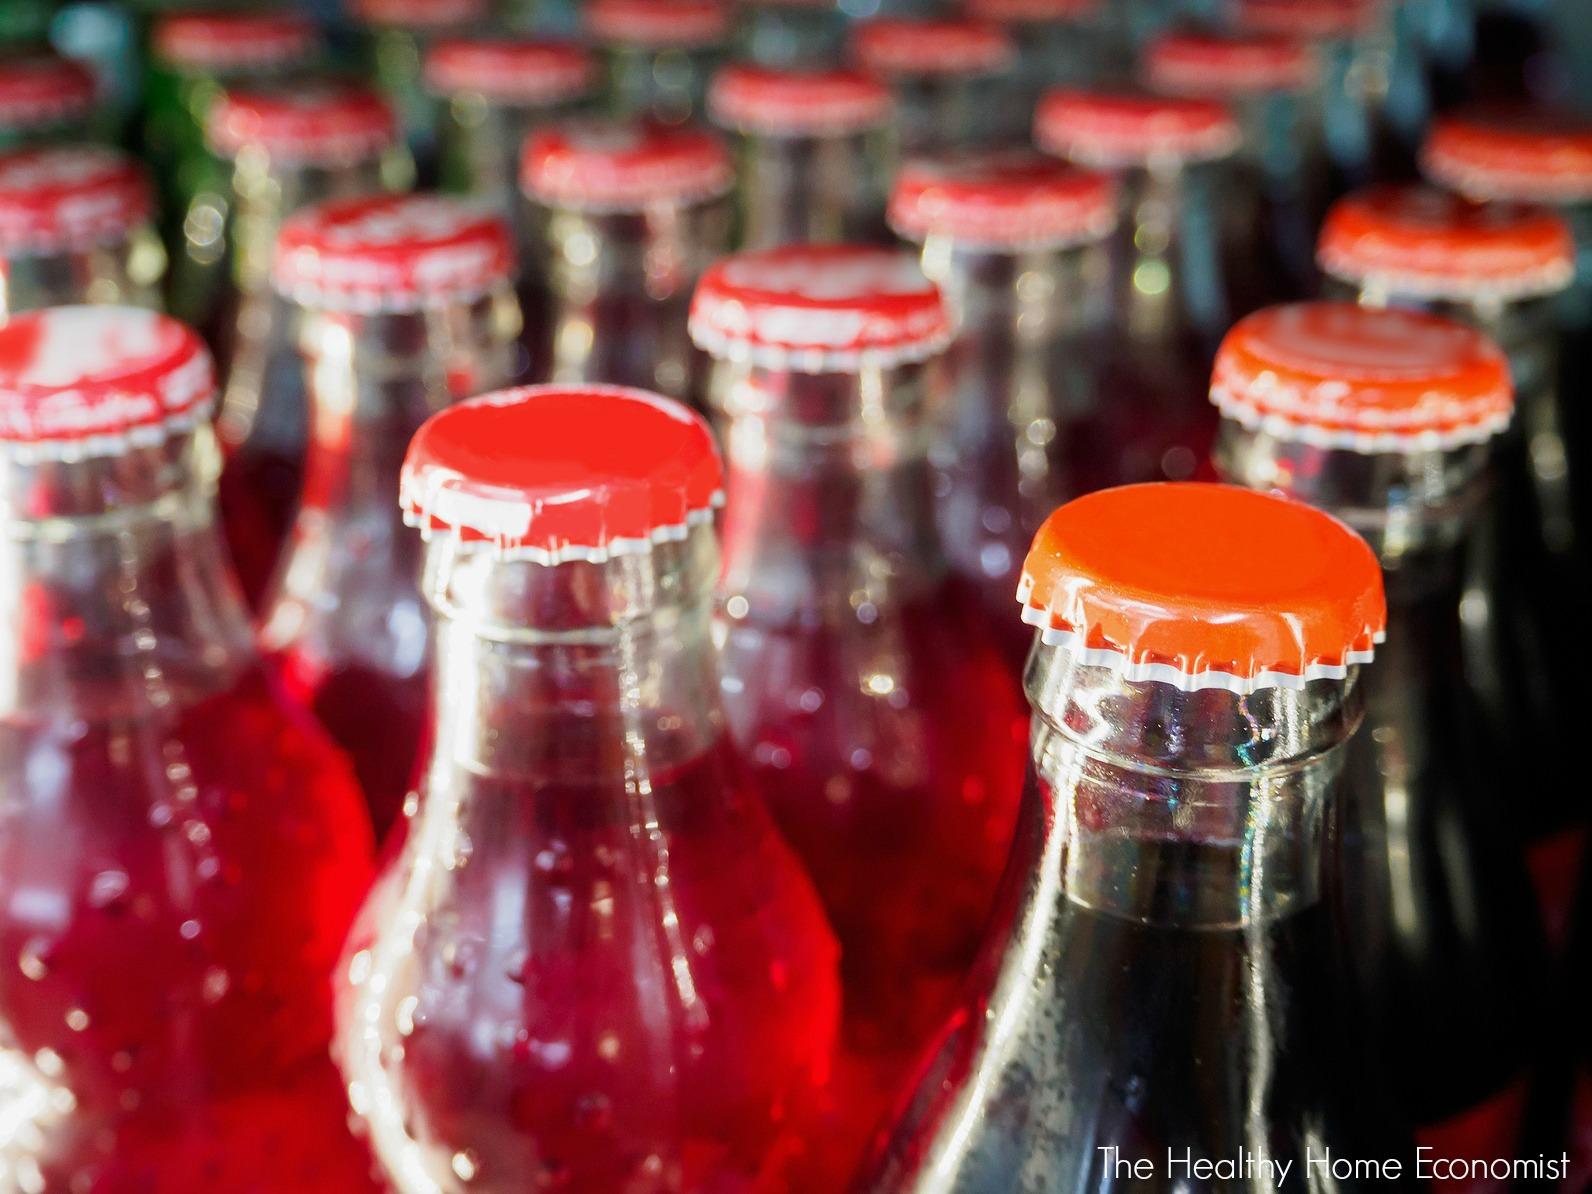 sodium benzoate beverages